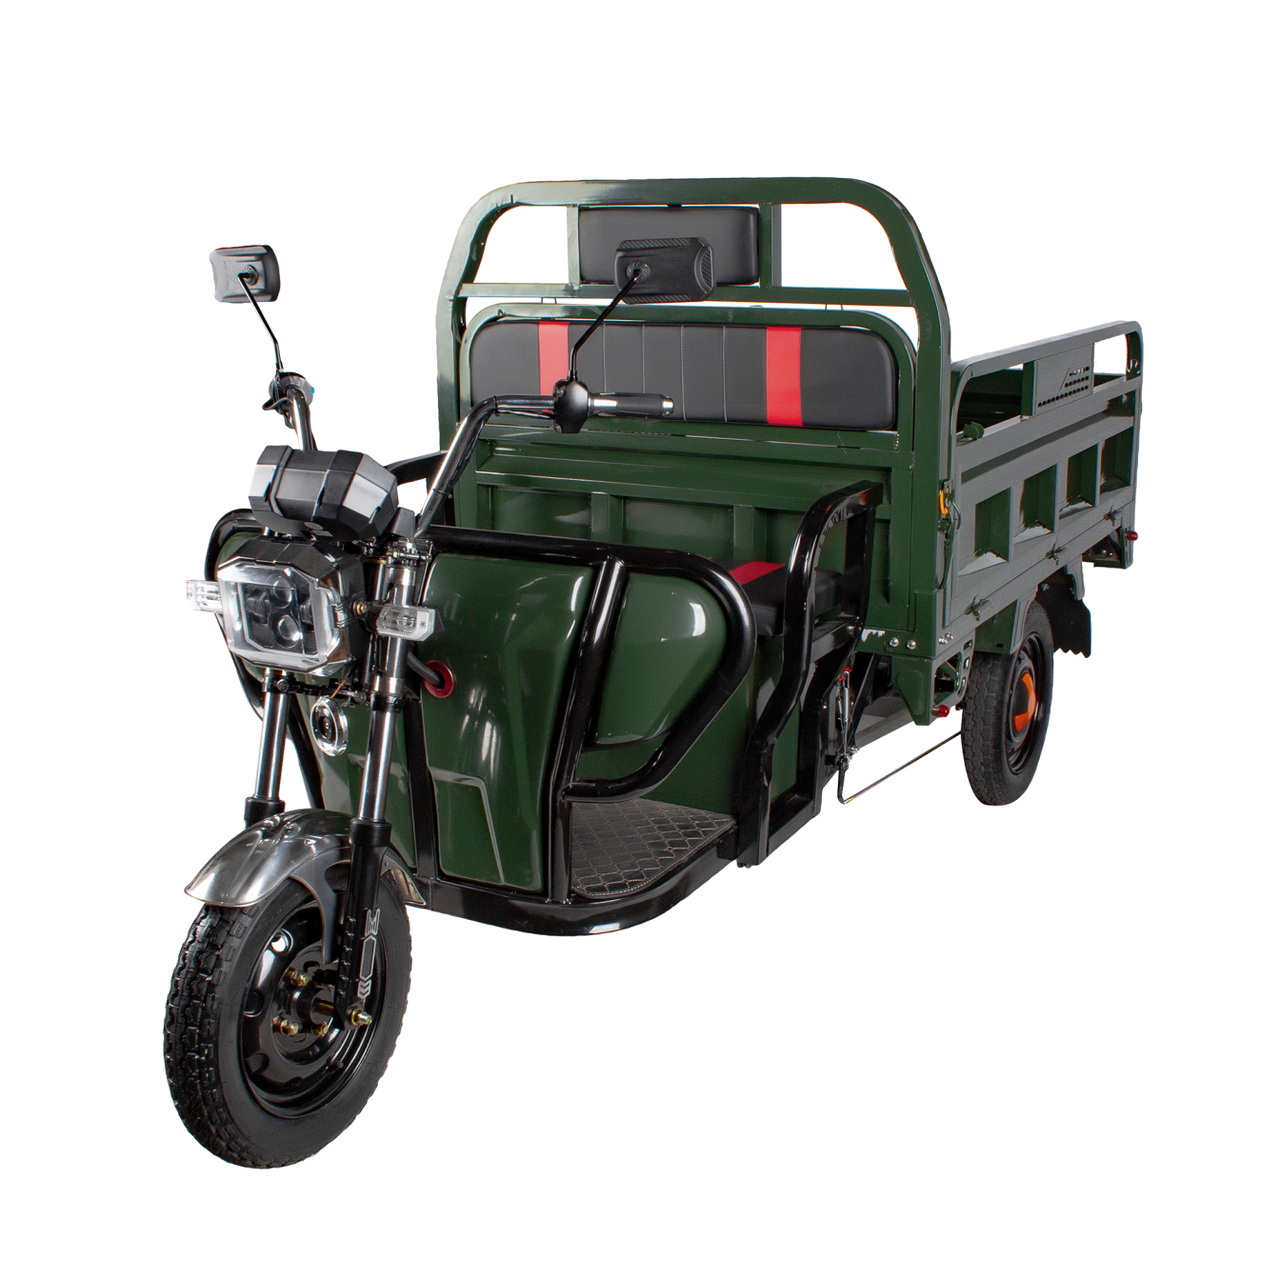 Электрический мопед TRIGO JJ1.6  1200W/60V/50AH(DZM) (зеленый)